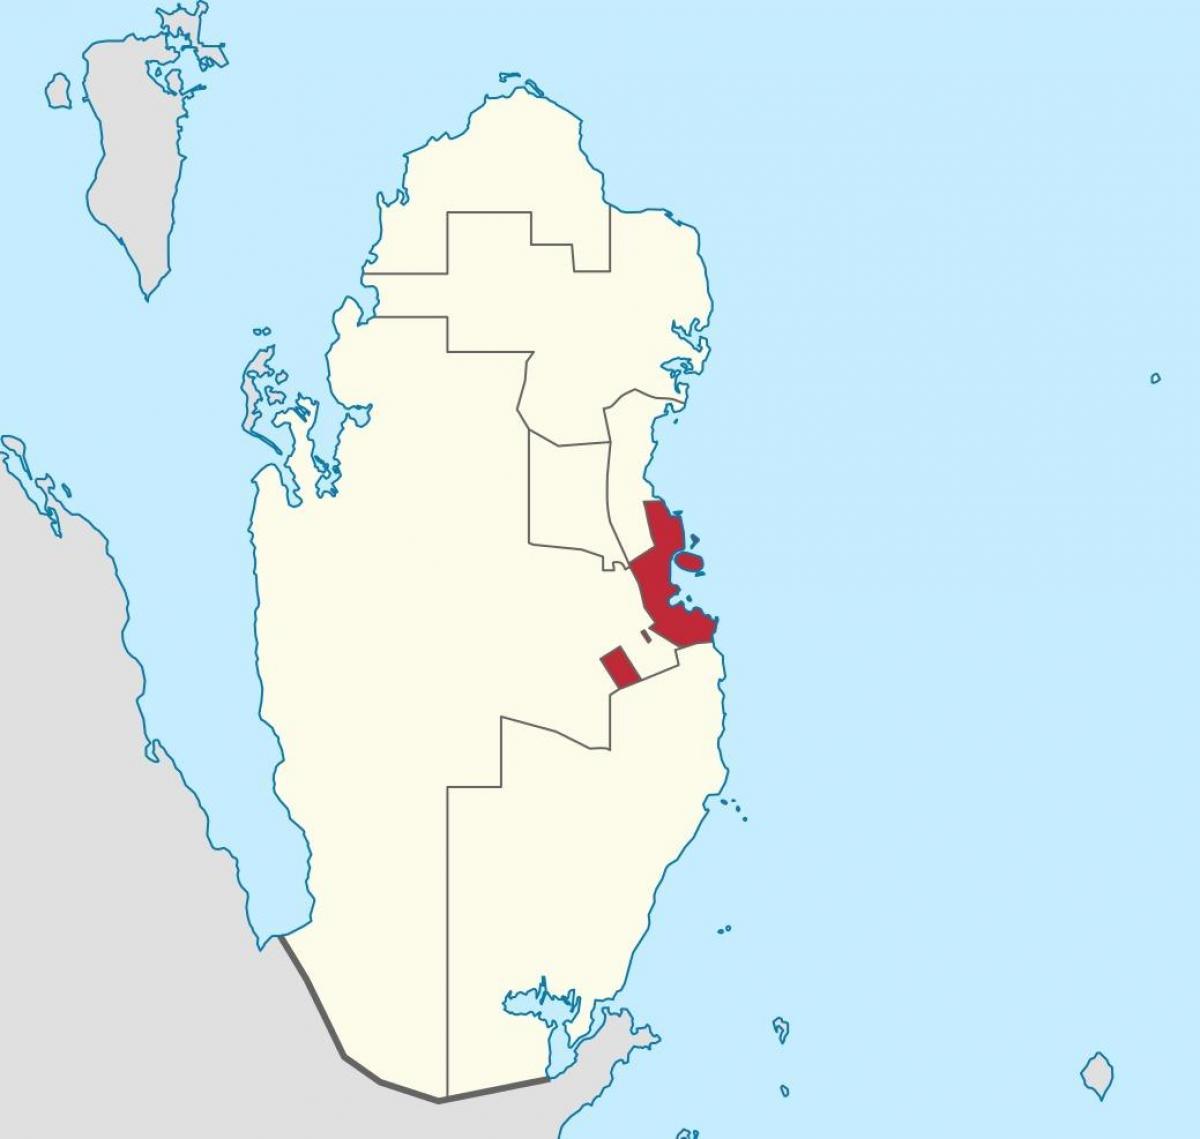 Doha Qatar Localizare Pe Harta Lumii Harta De Doha Qatar